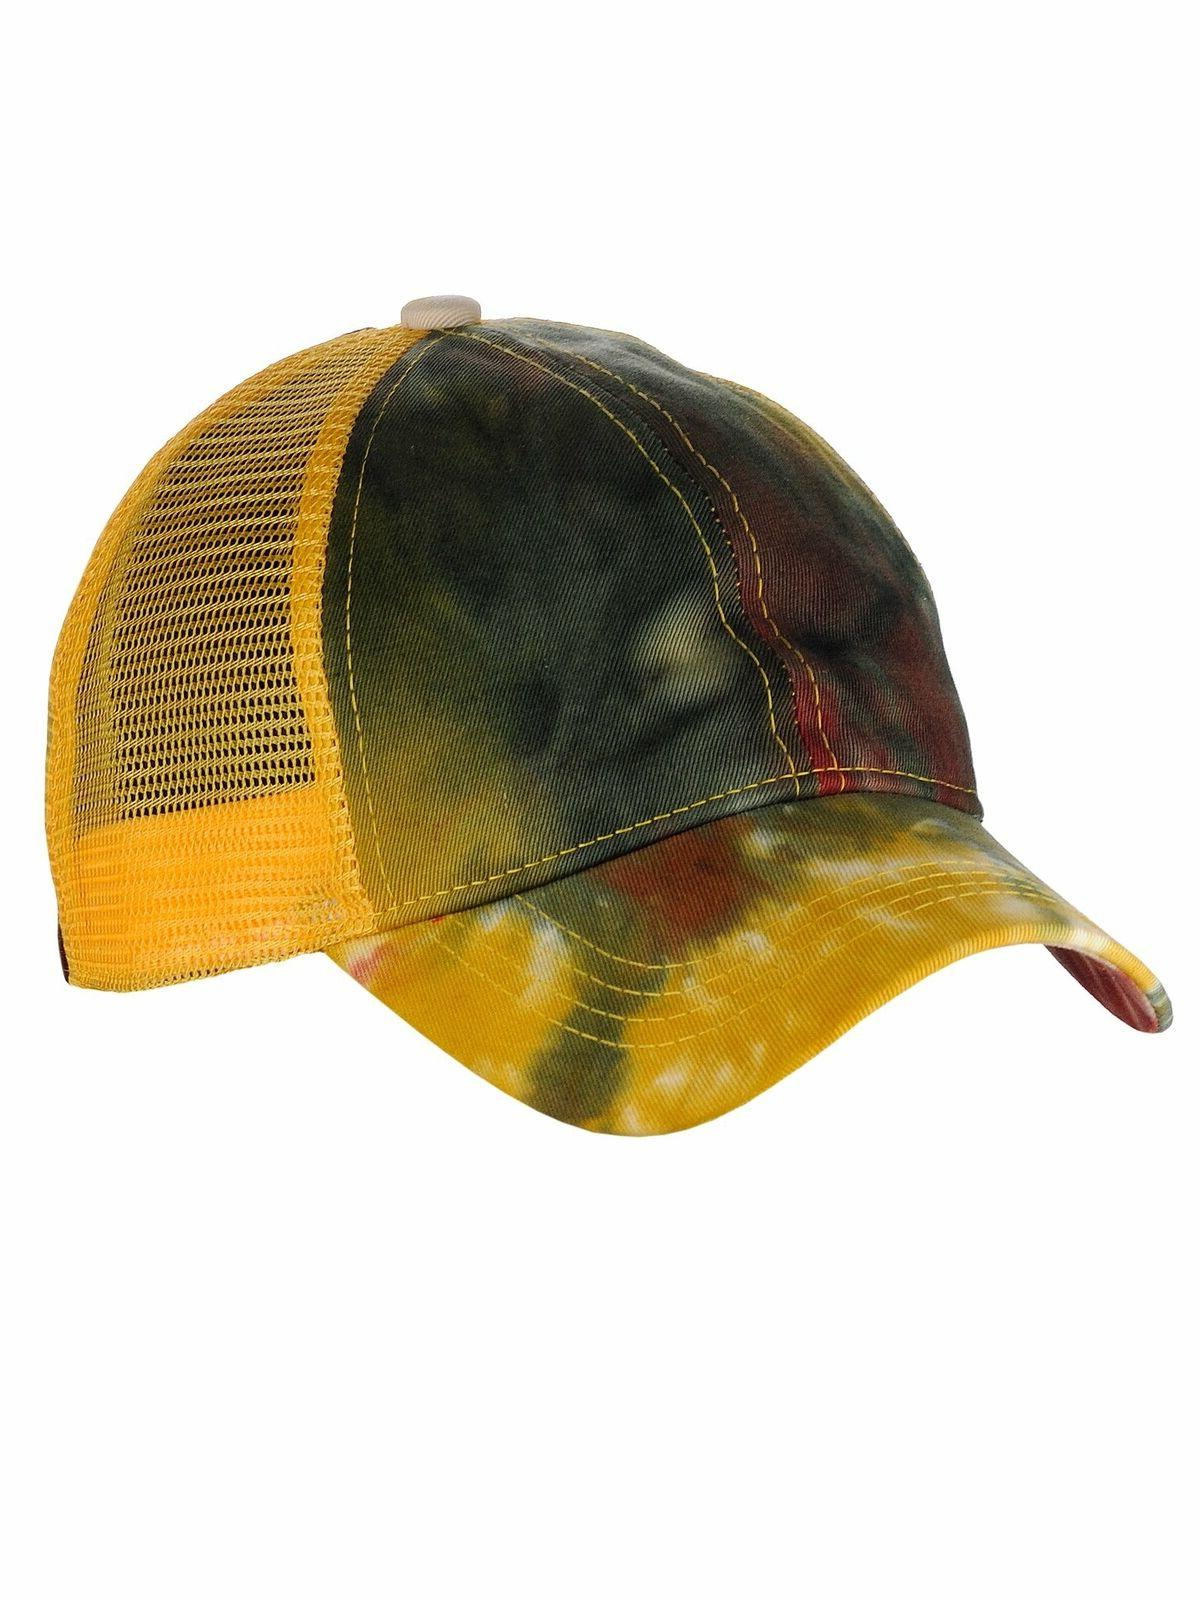 C.C Ponycap Bun Ponytail Adjustable Dye Cap